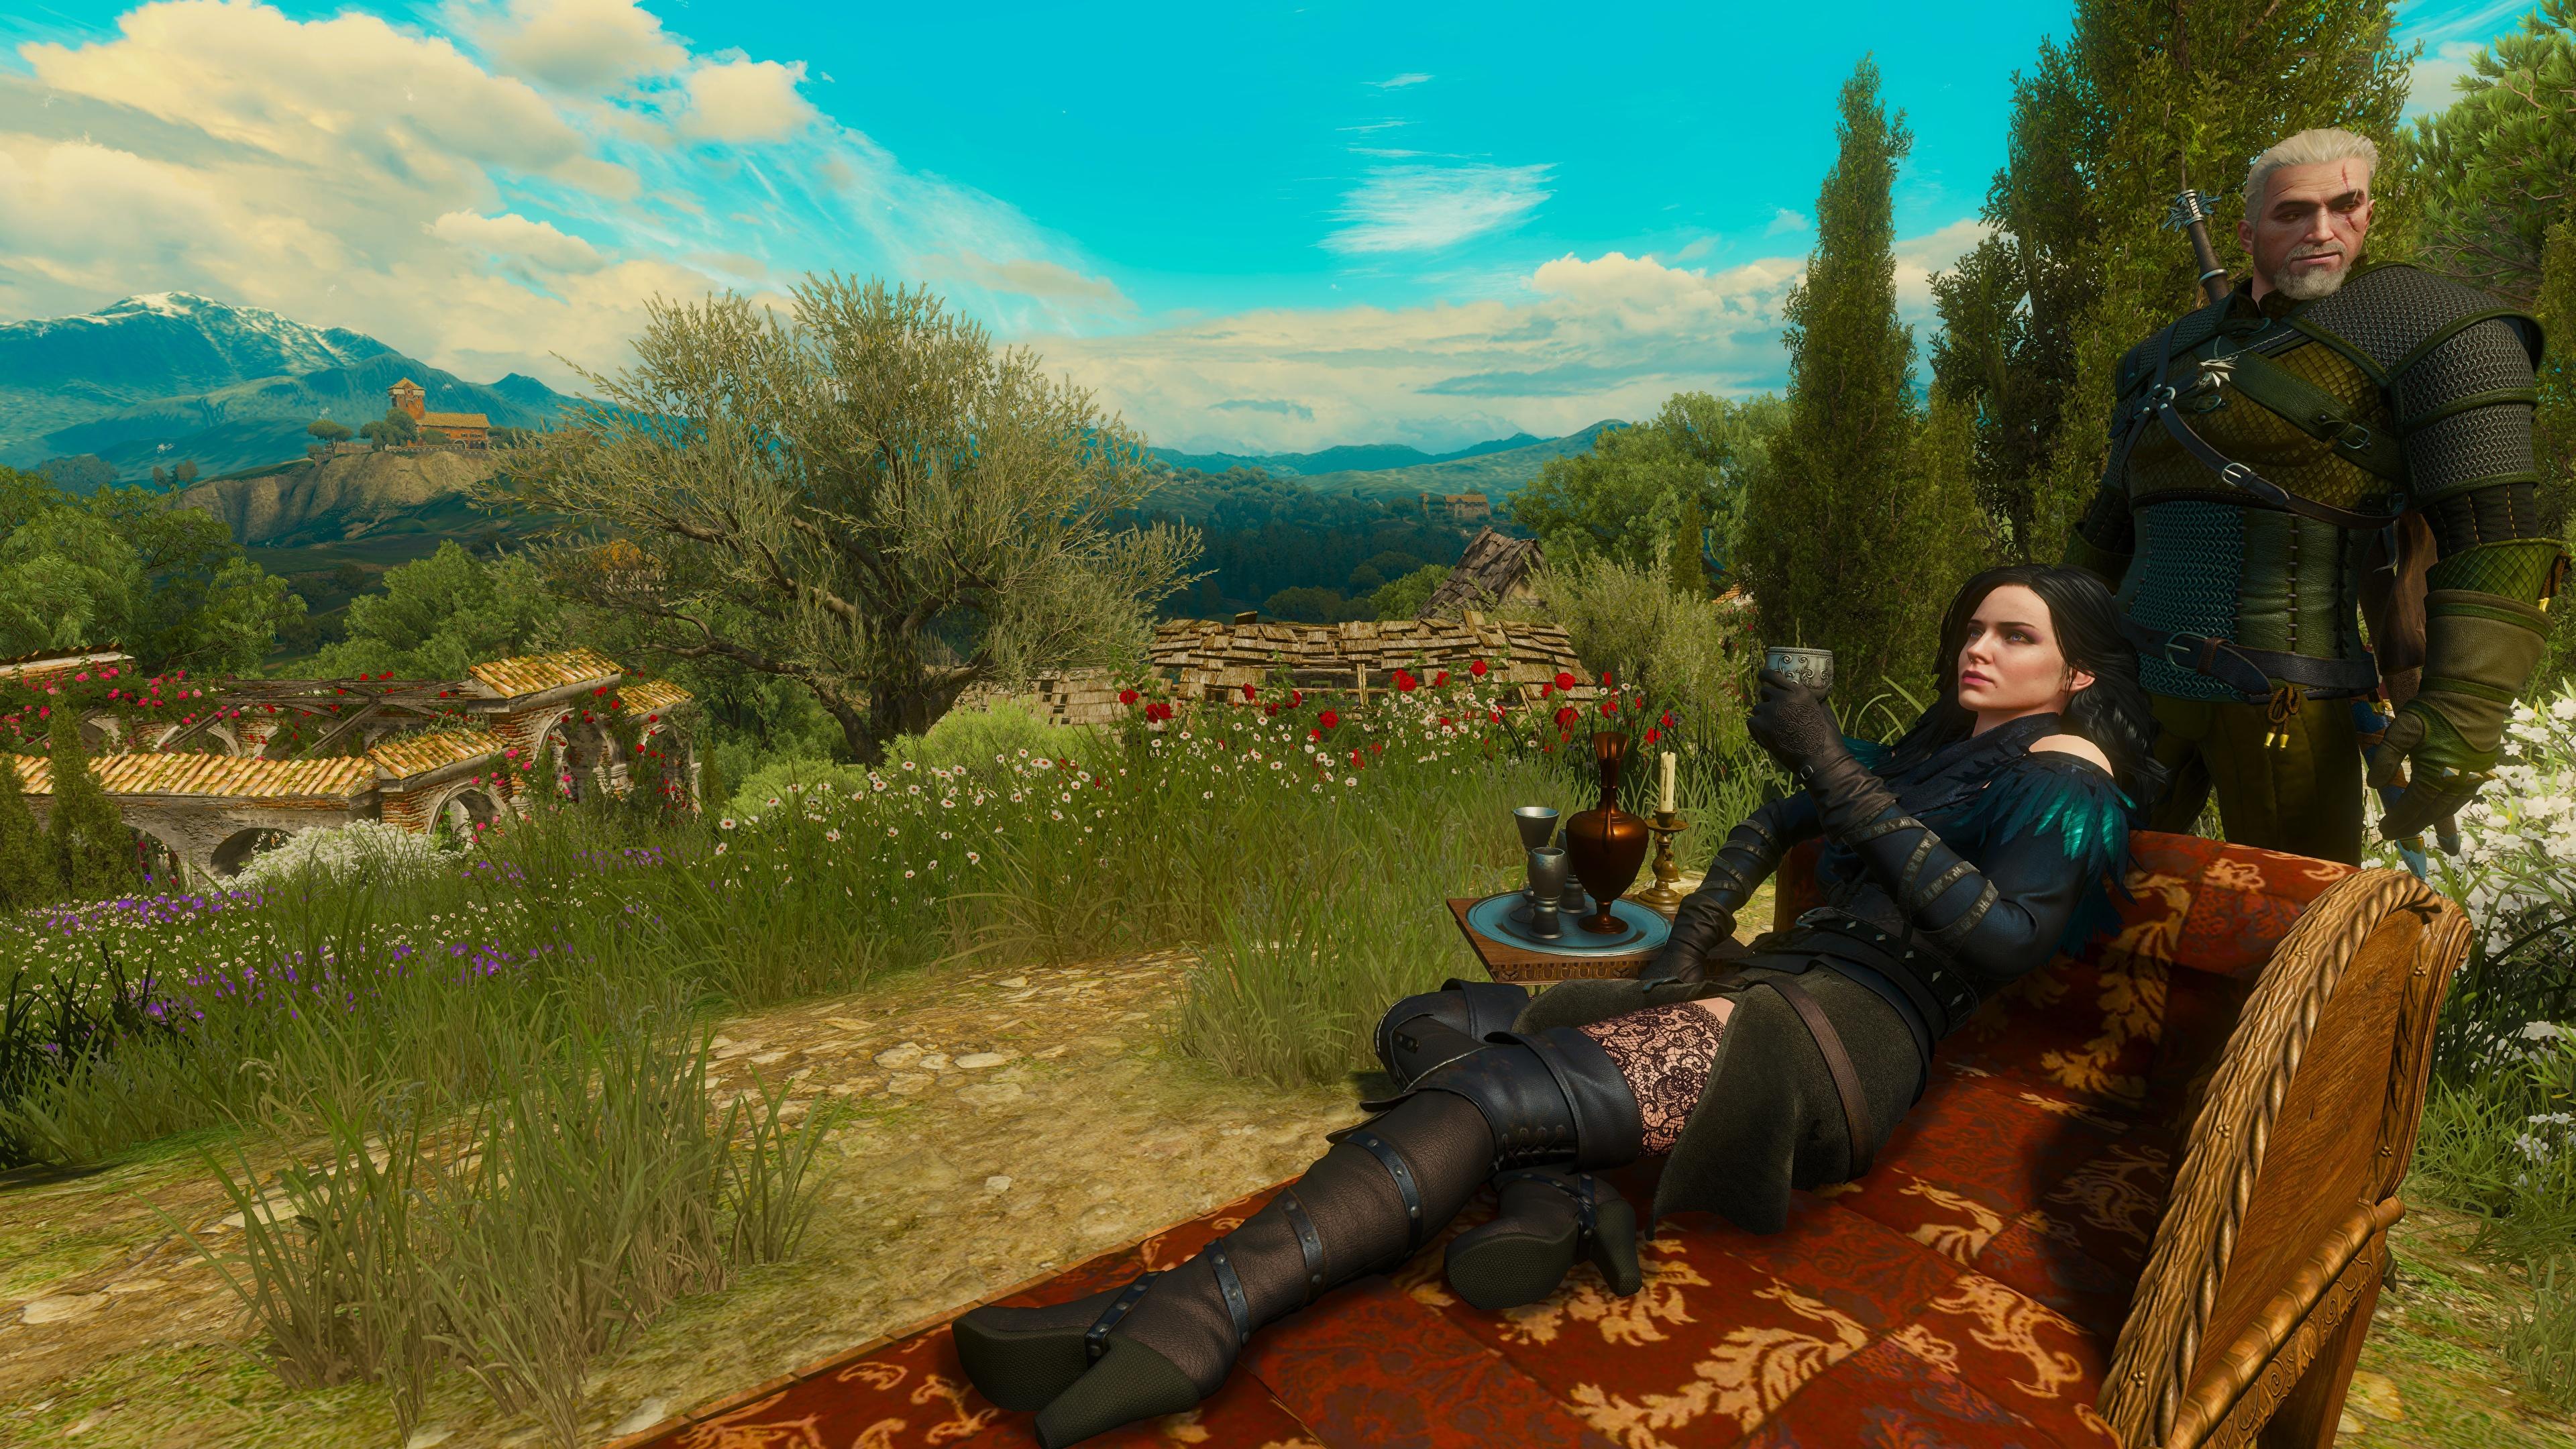 Fondos De Pantalla 3840x2160 The Witcher 3 Wild Hunt Geralt